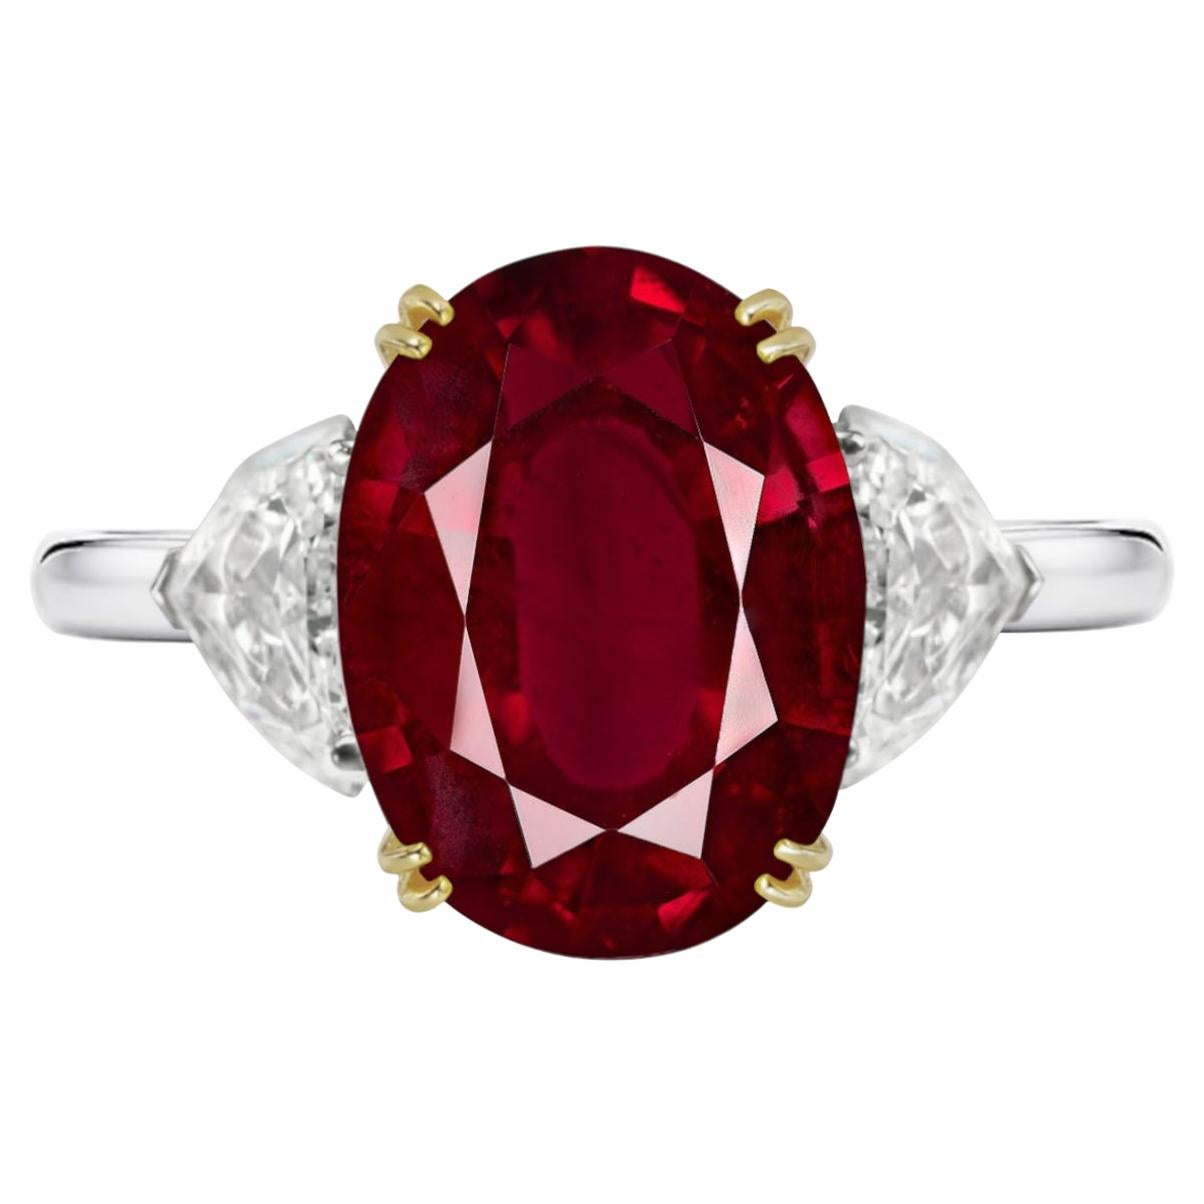 IGI ANTWERP Certified 4.75 Carat Oval Peagon's Blood  Red Ruby Ring